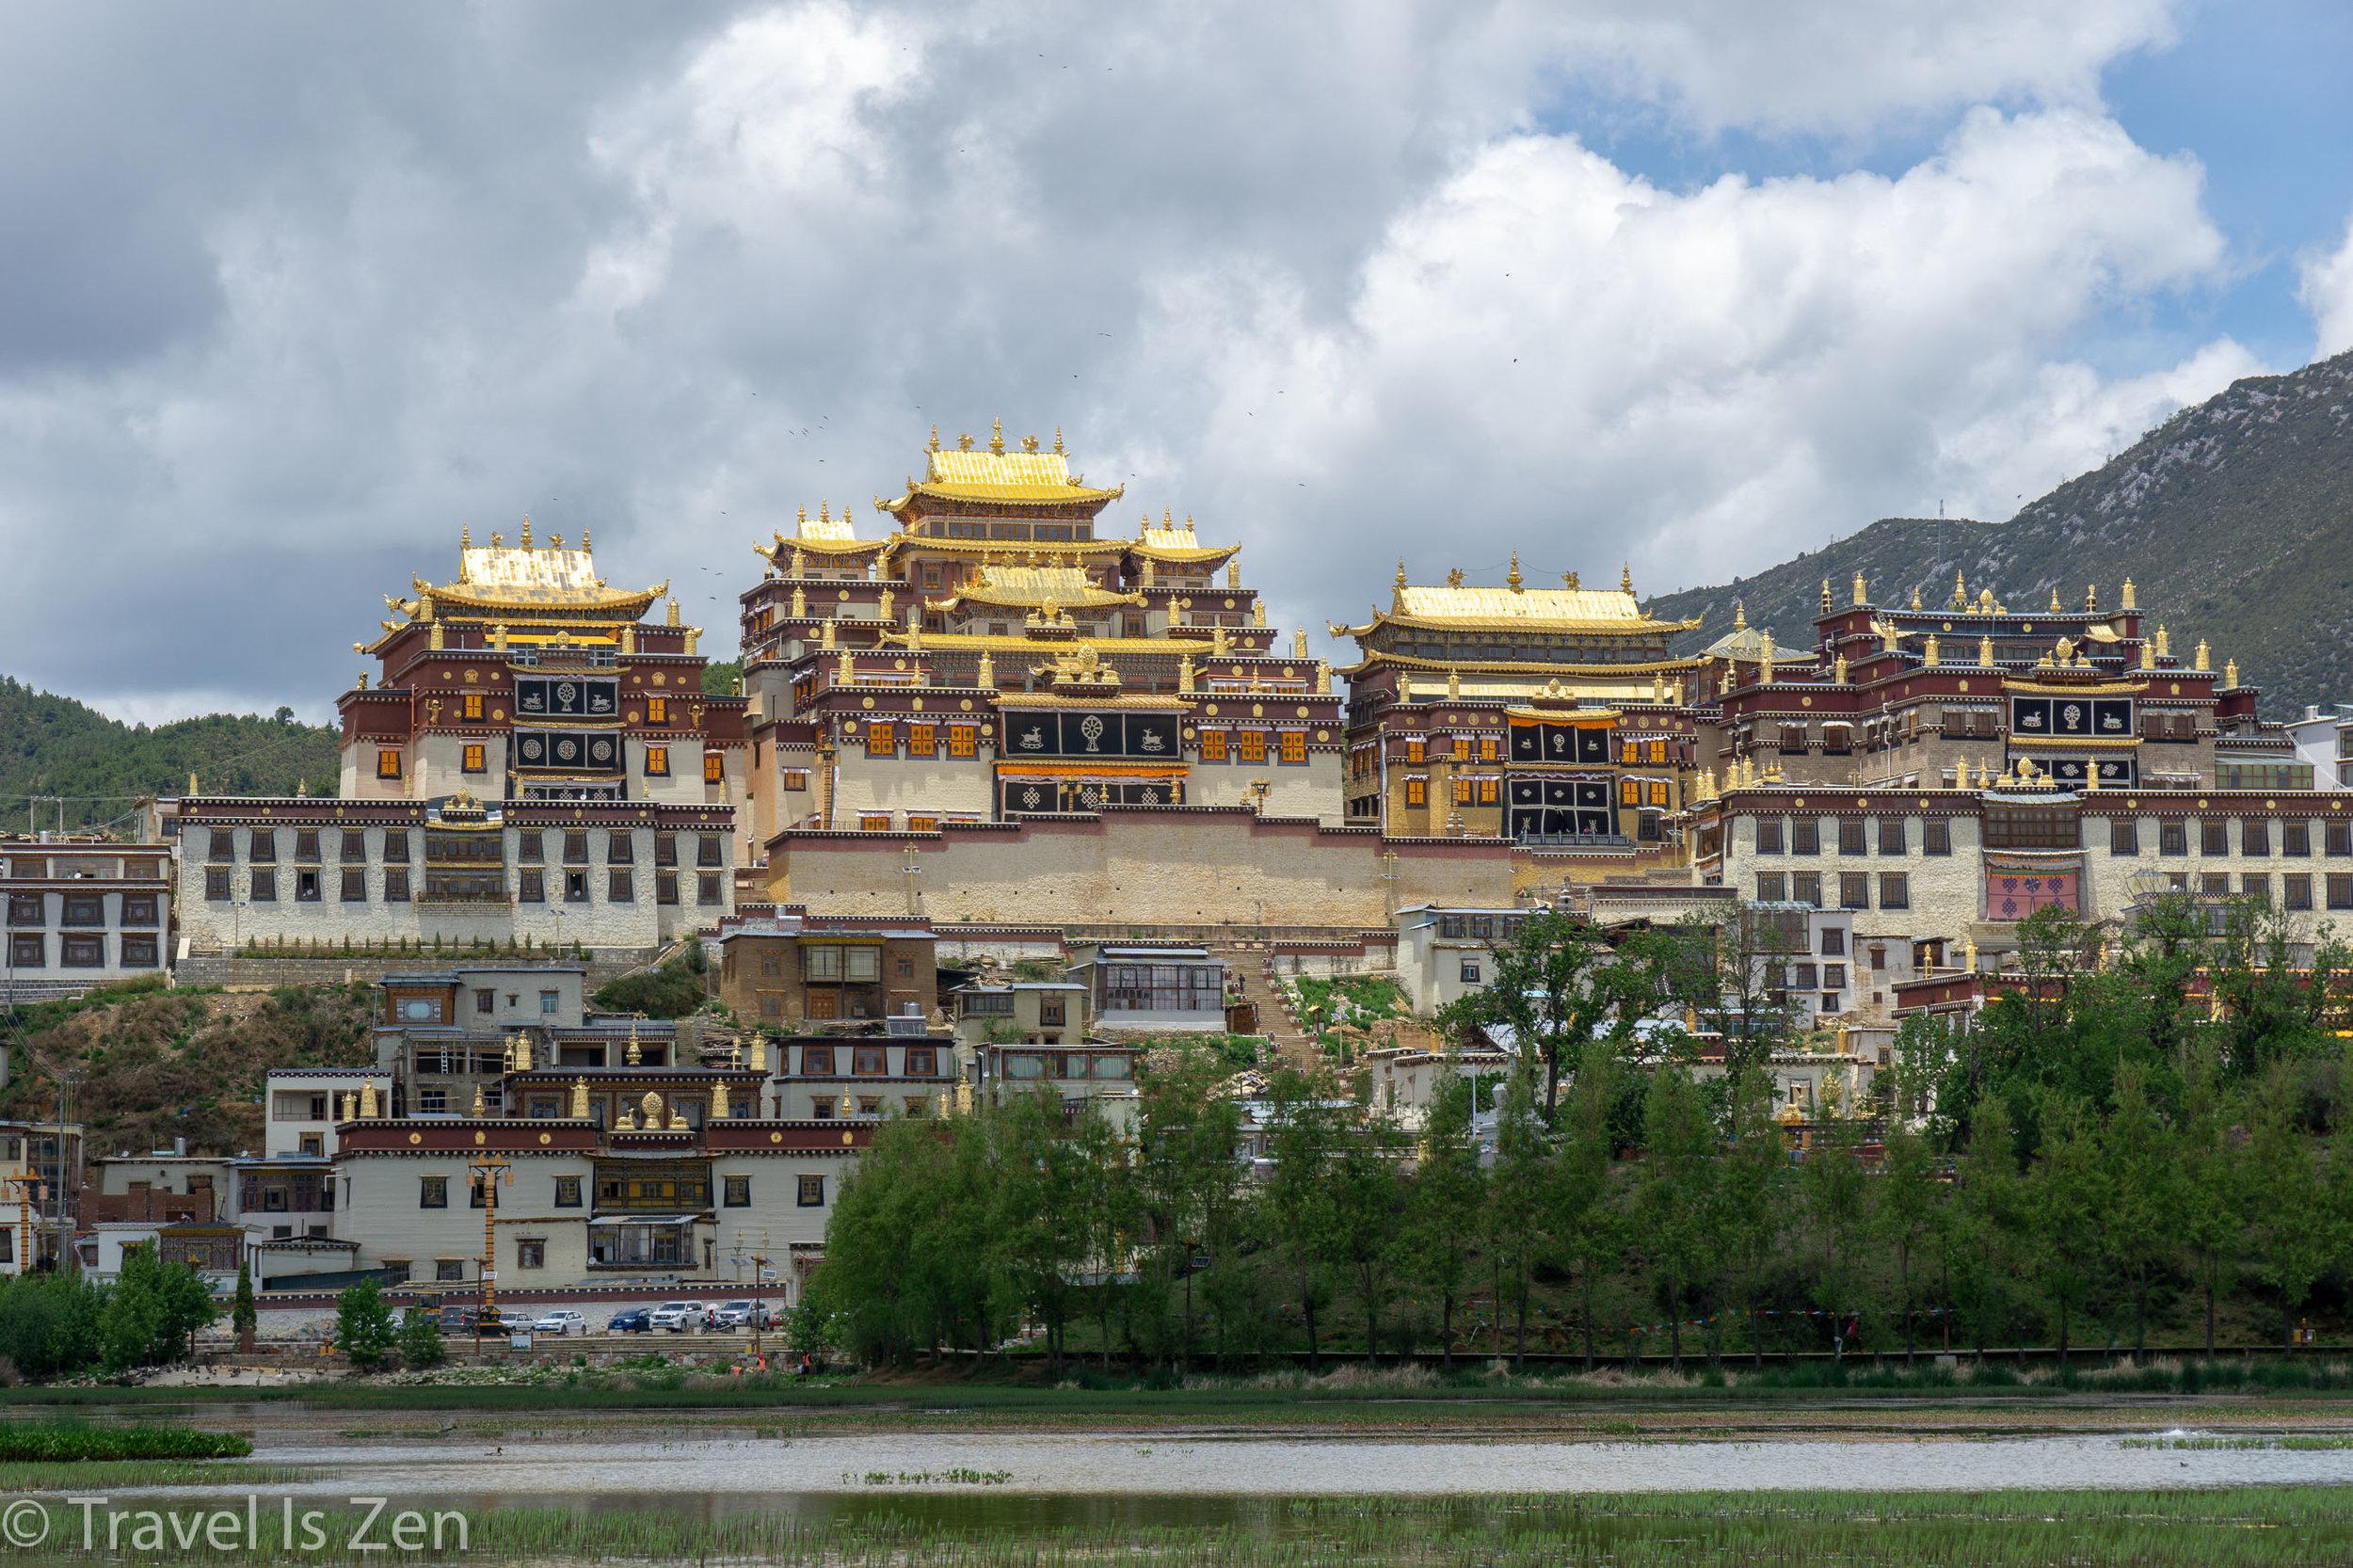 Ganden Sumtsenling Monastery